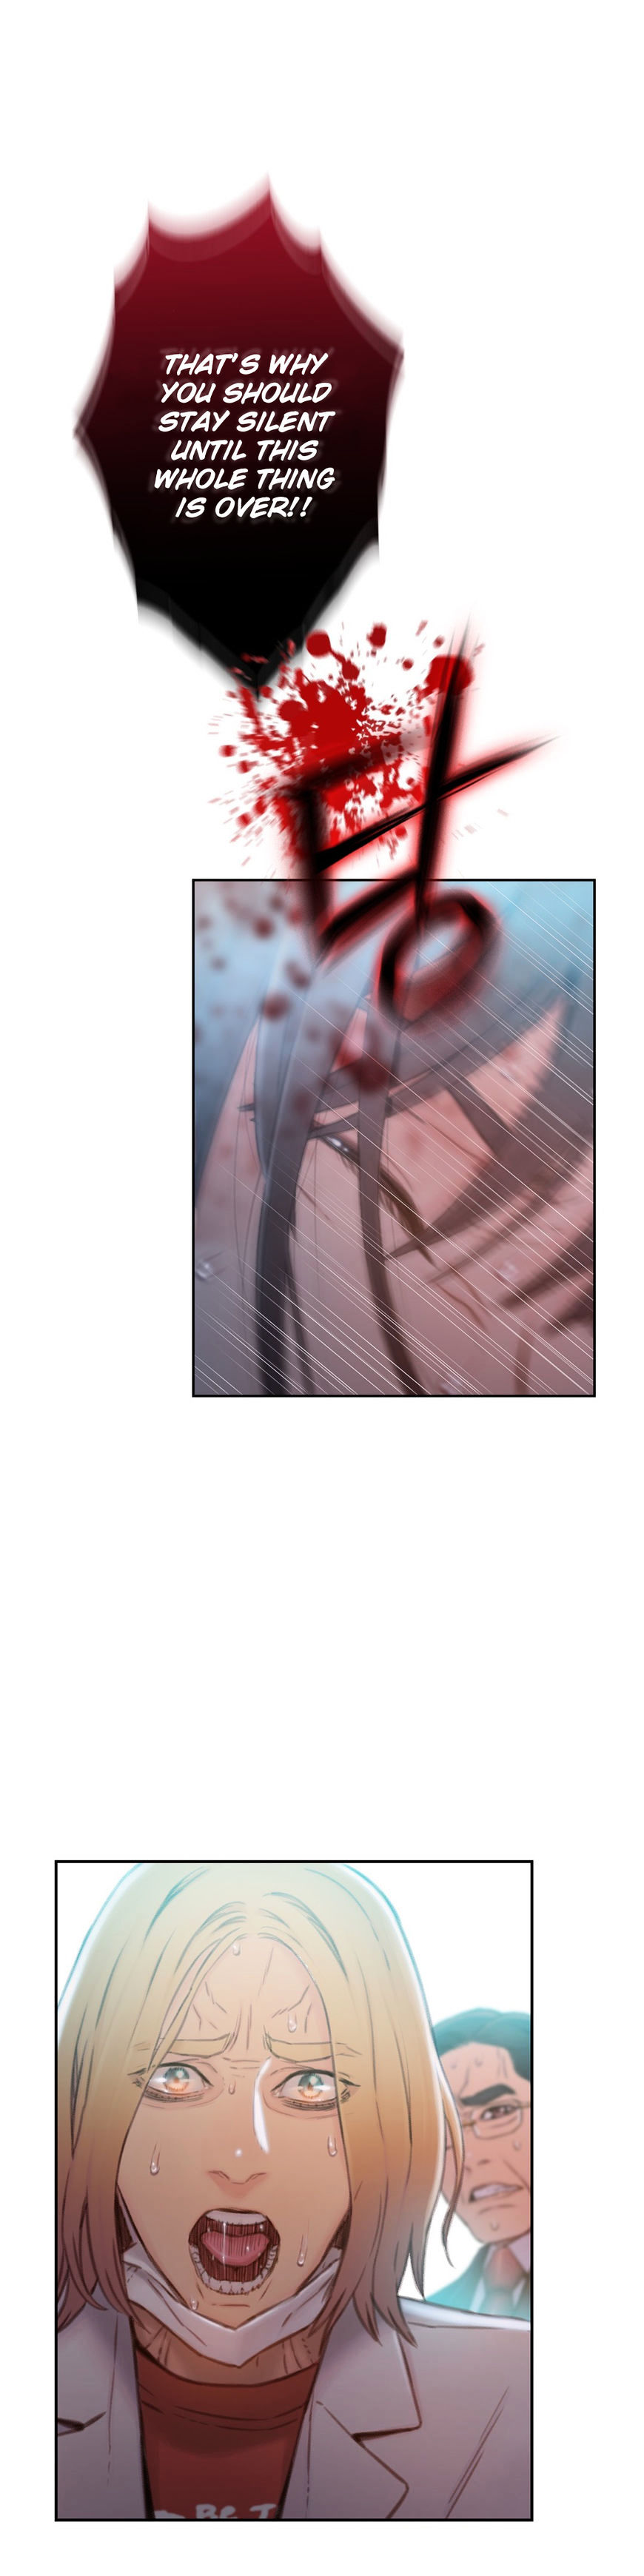 Sweet Guy Chapter 73 Full Manga Read Scan Image 19